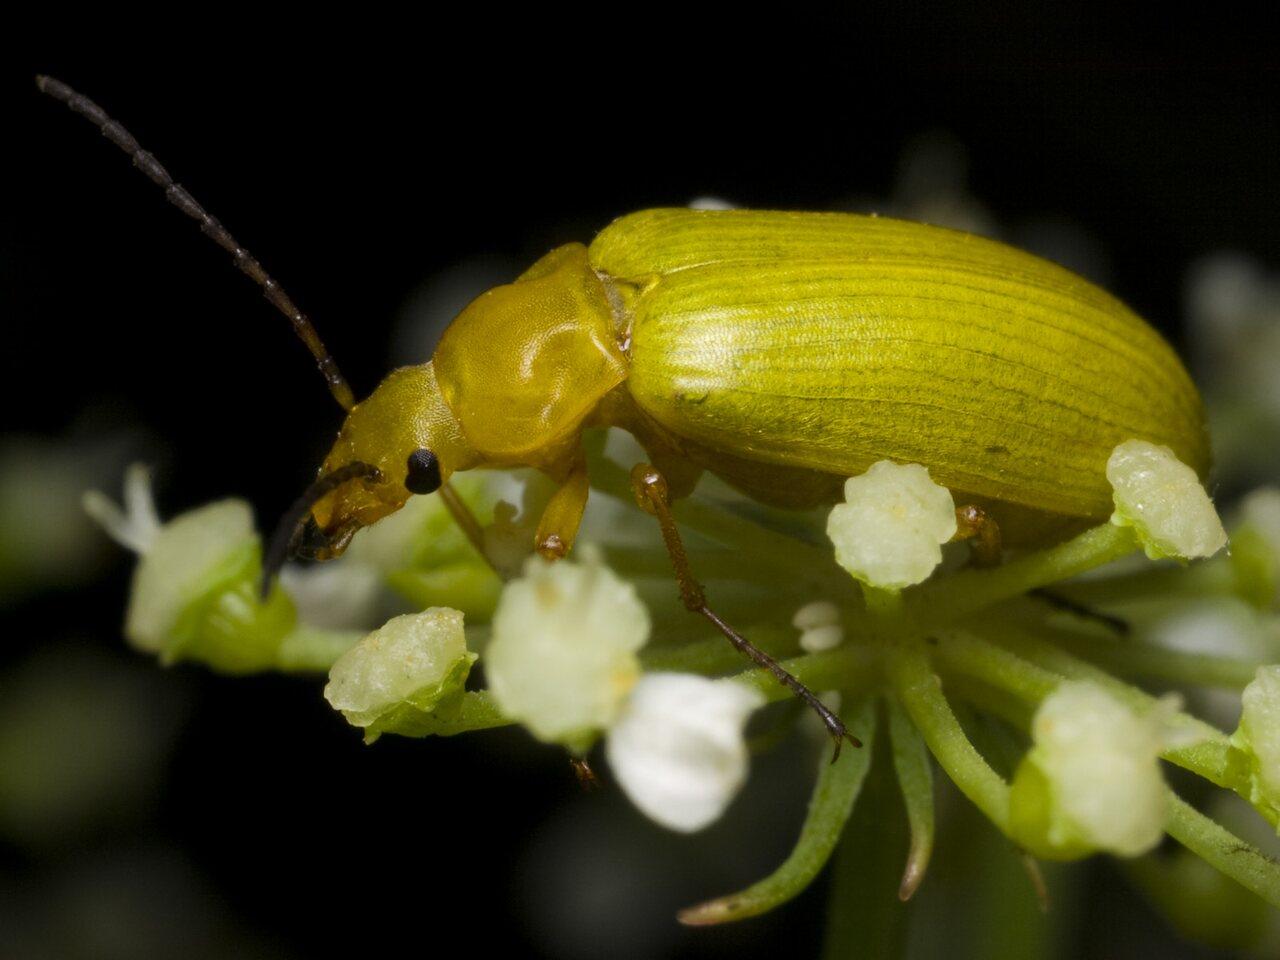 Cteniopus-flavus-1318.jpg